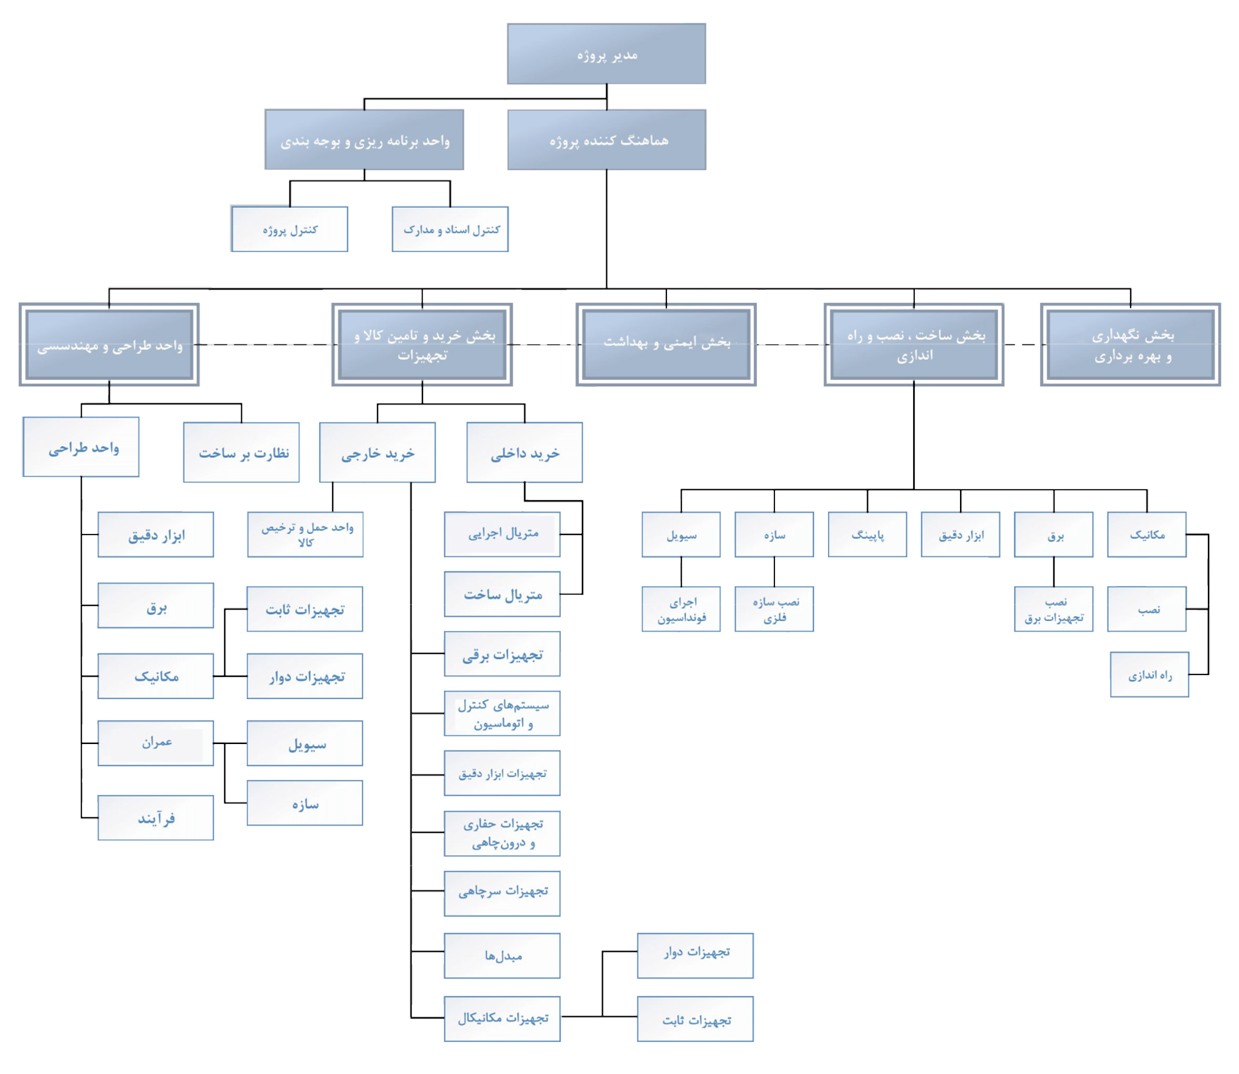 چارت سازمانی شرکت ایده